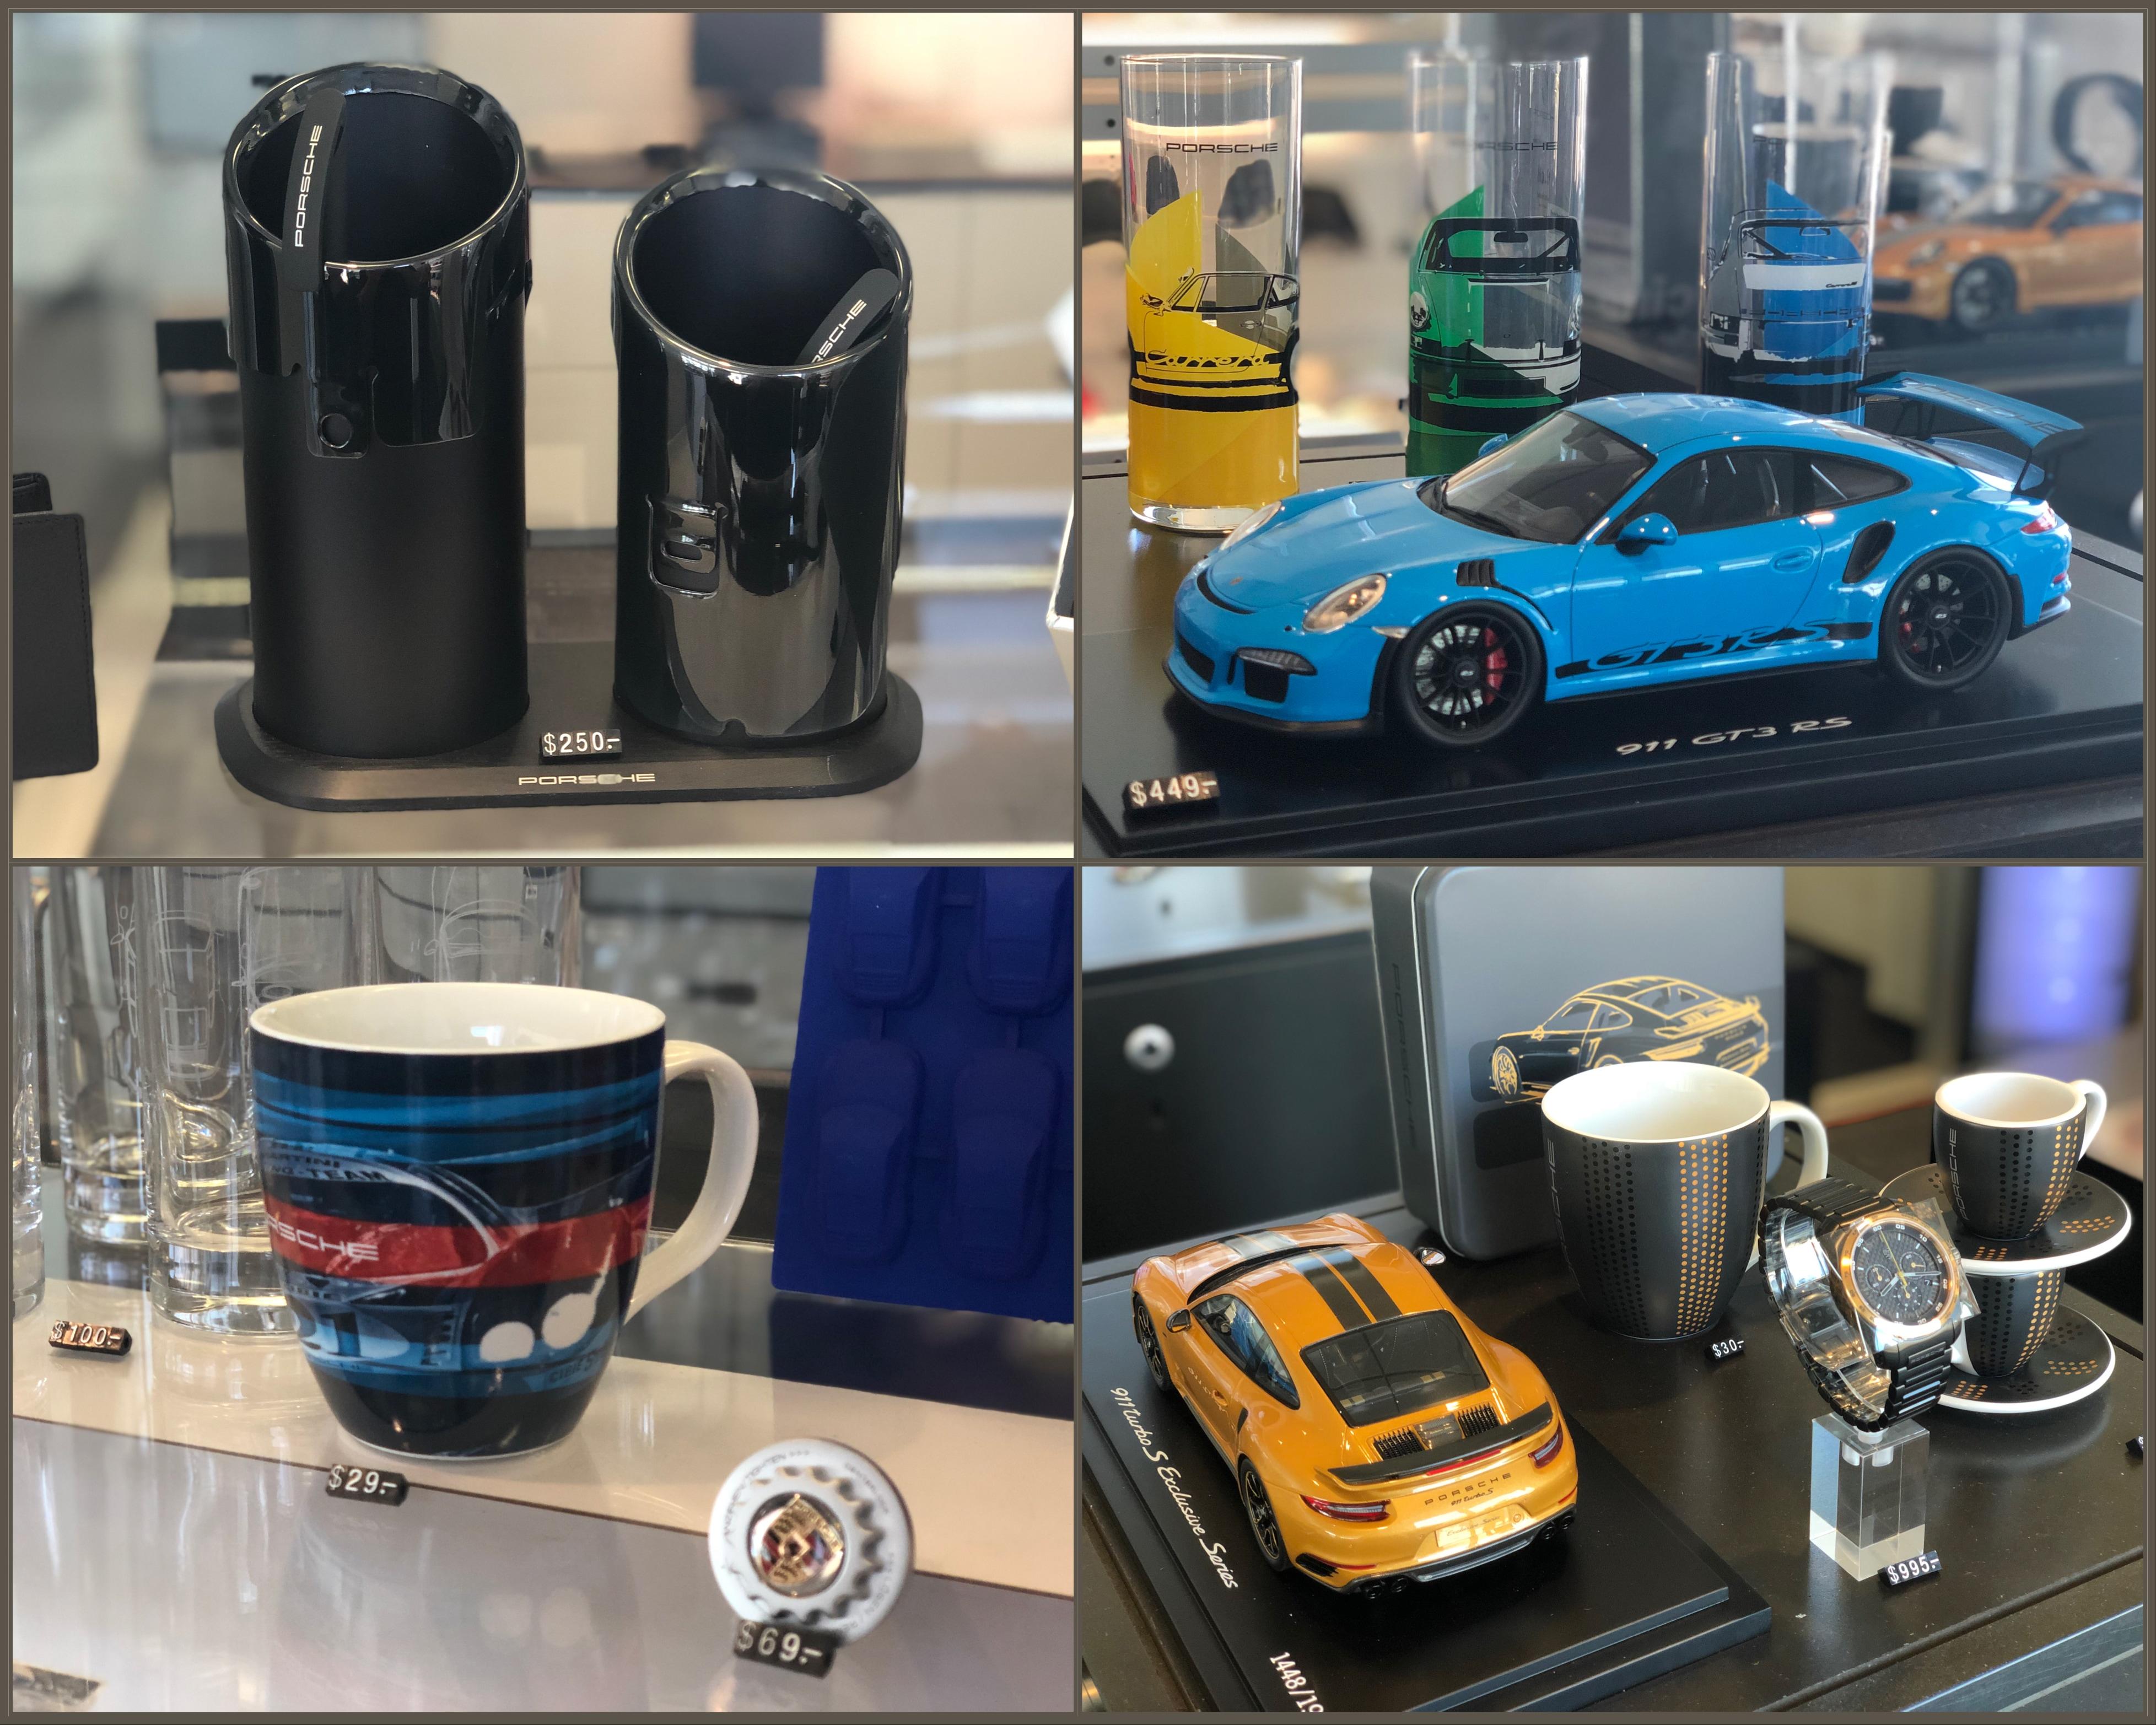 Porsche Auto Parts & Accessories Store | Houston, near Katy